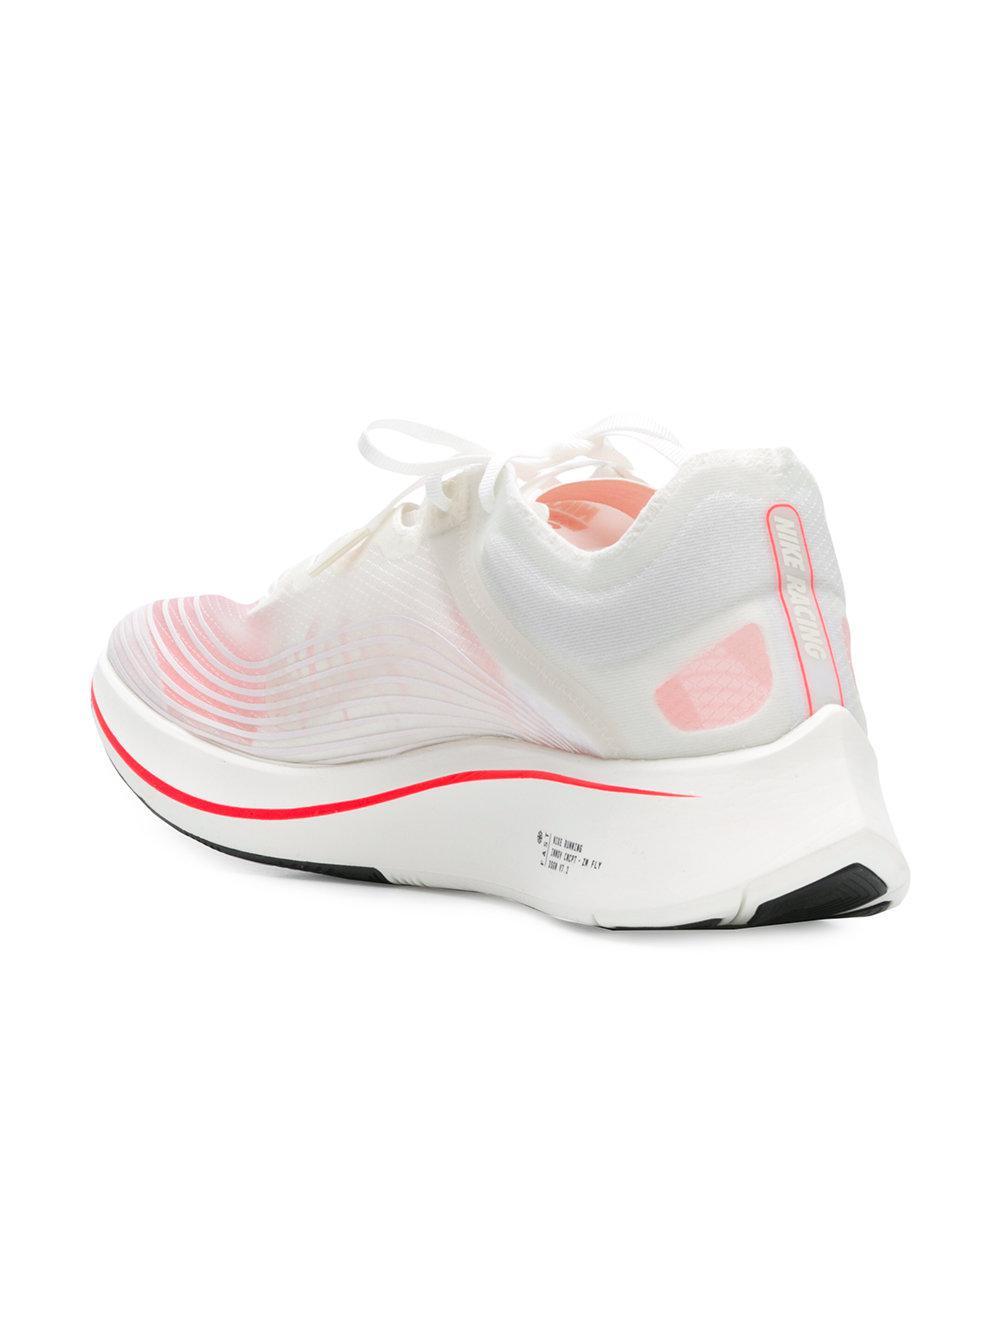 cdb07c8310022 Nike - White Zoom Fly Sp - Lyst. View fullscreen